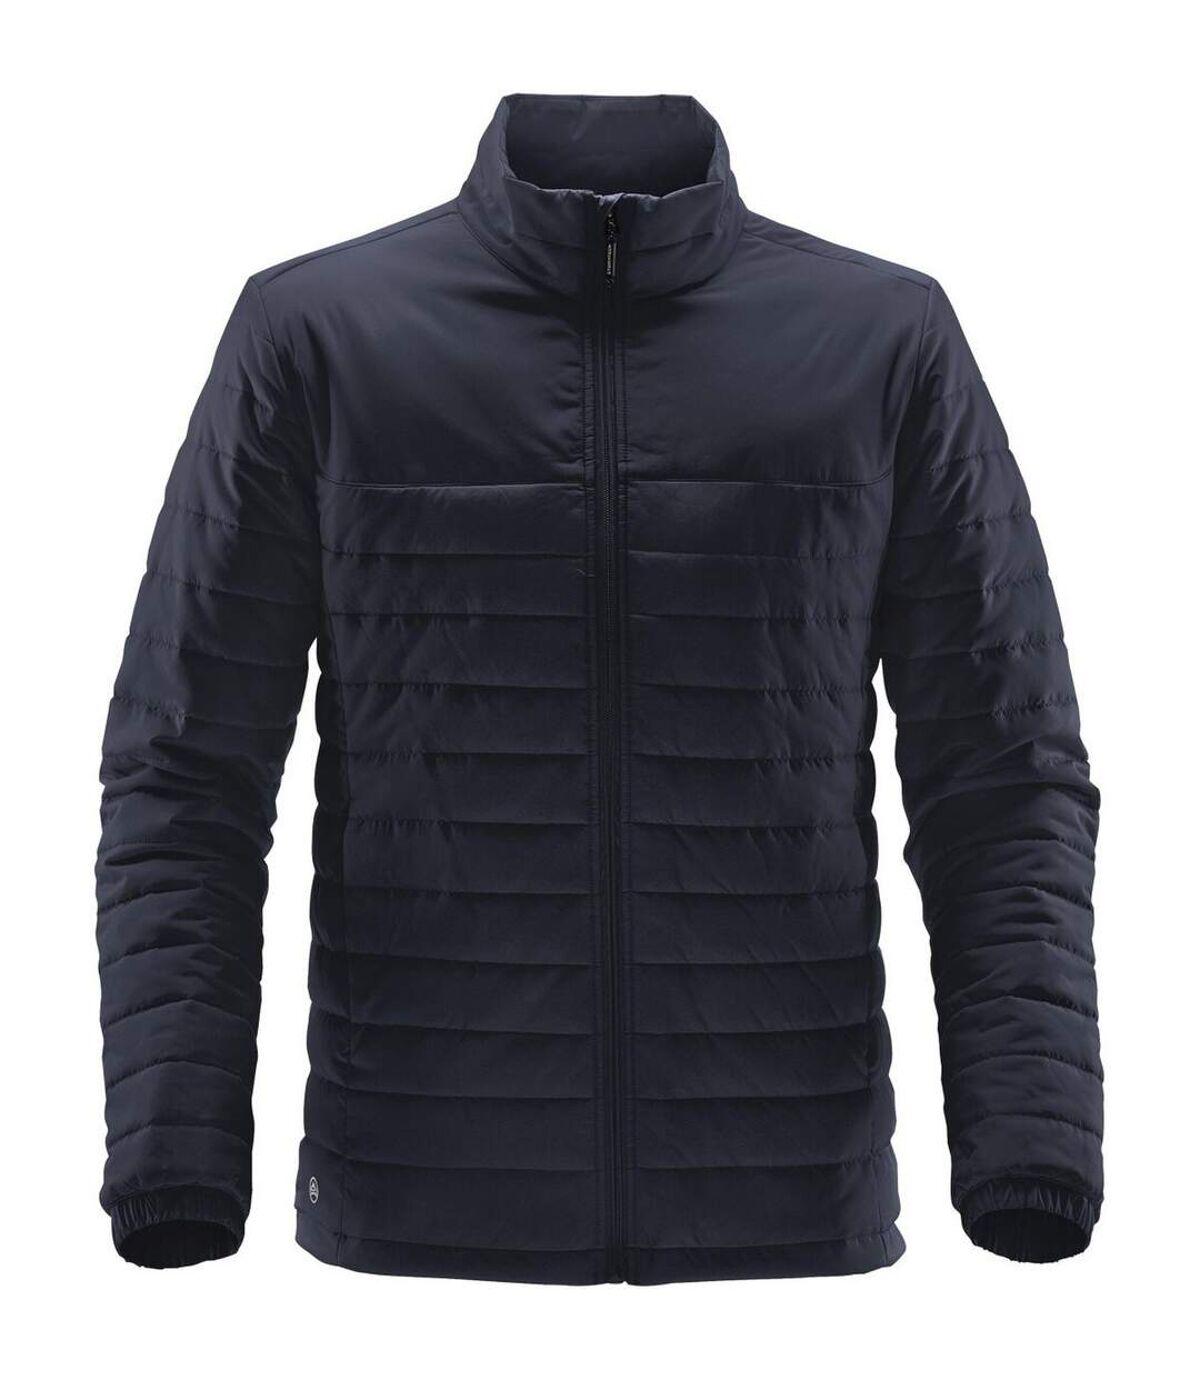 Stormtech Mens Nautilus Jacket (Black) - UTBC4125